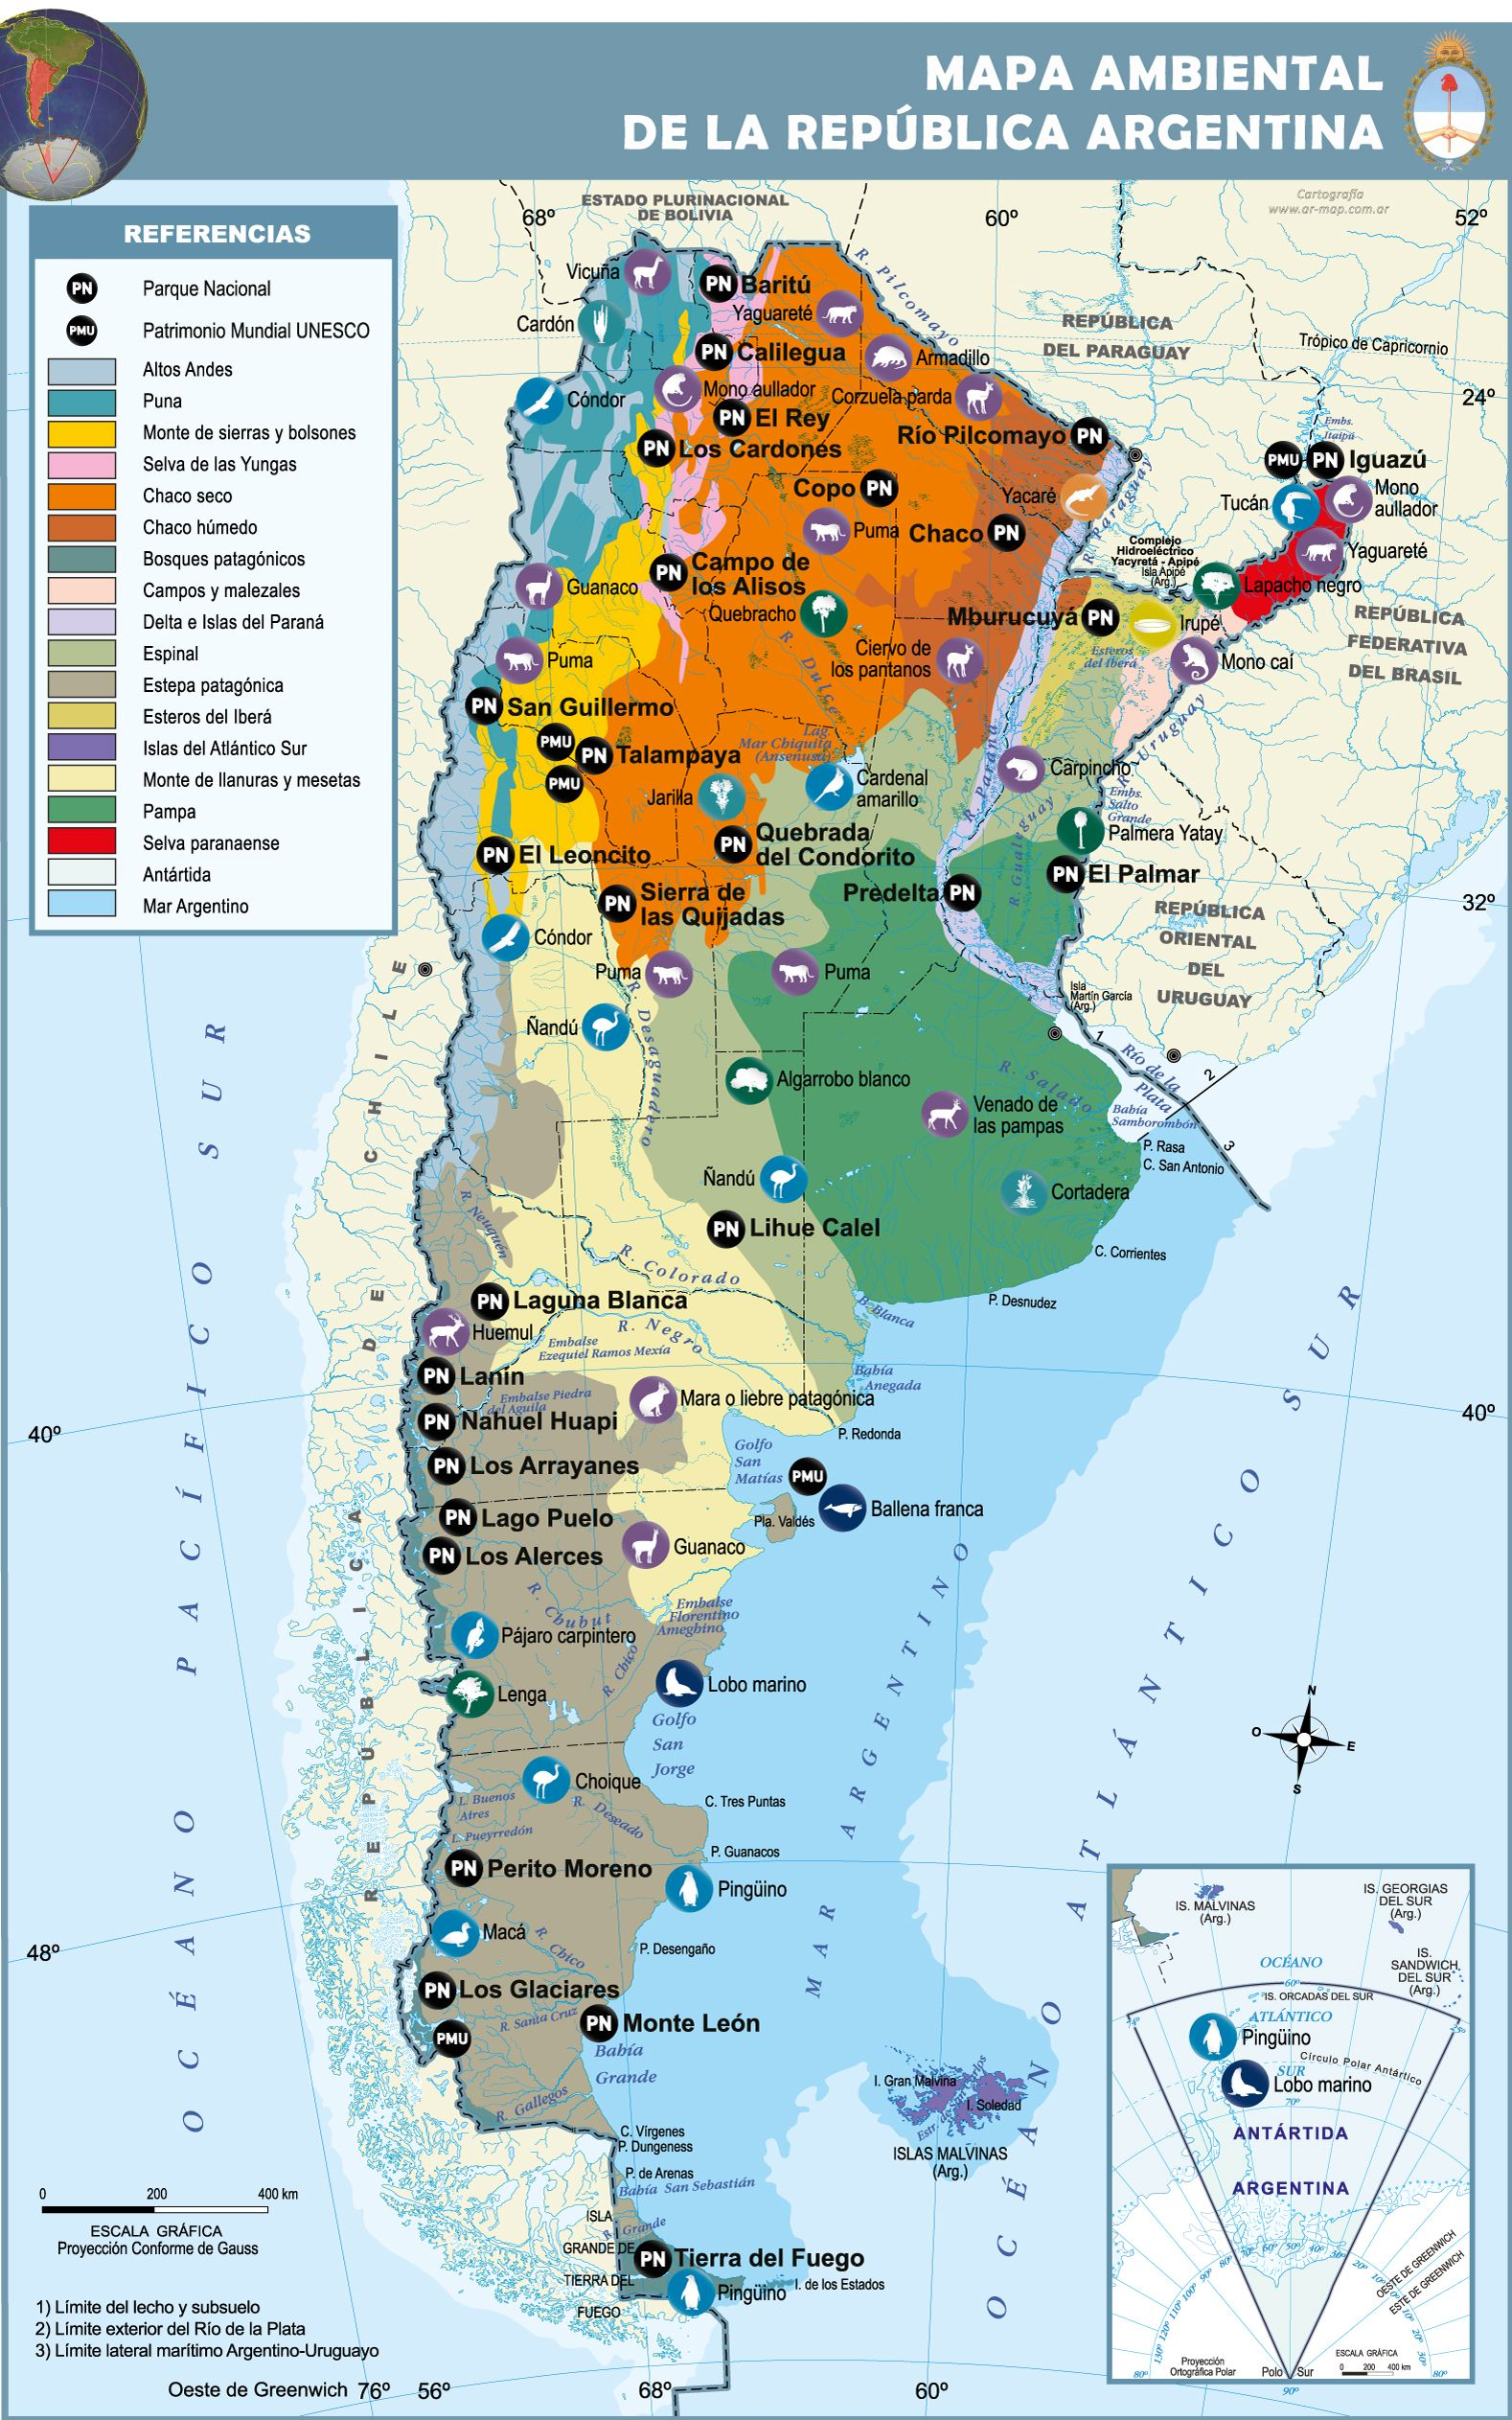 Mapa de Argentina | Maria | Pinterest | mapa de Argentina, Mapas y ...